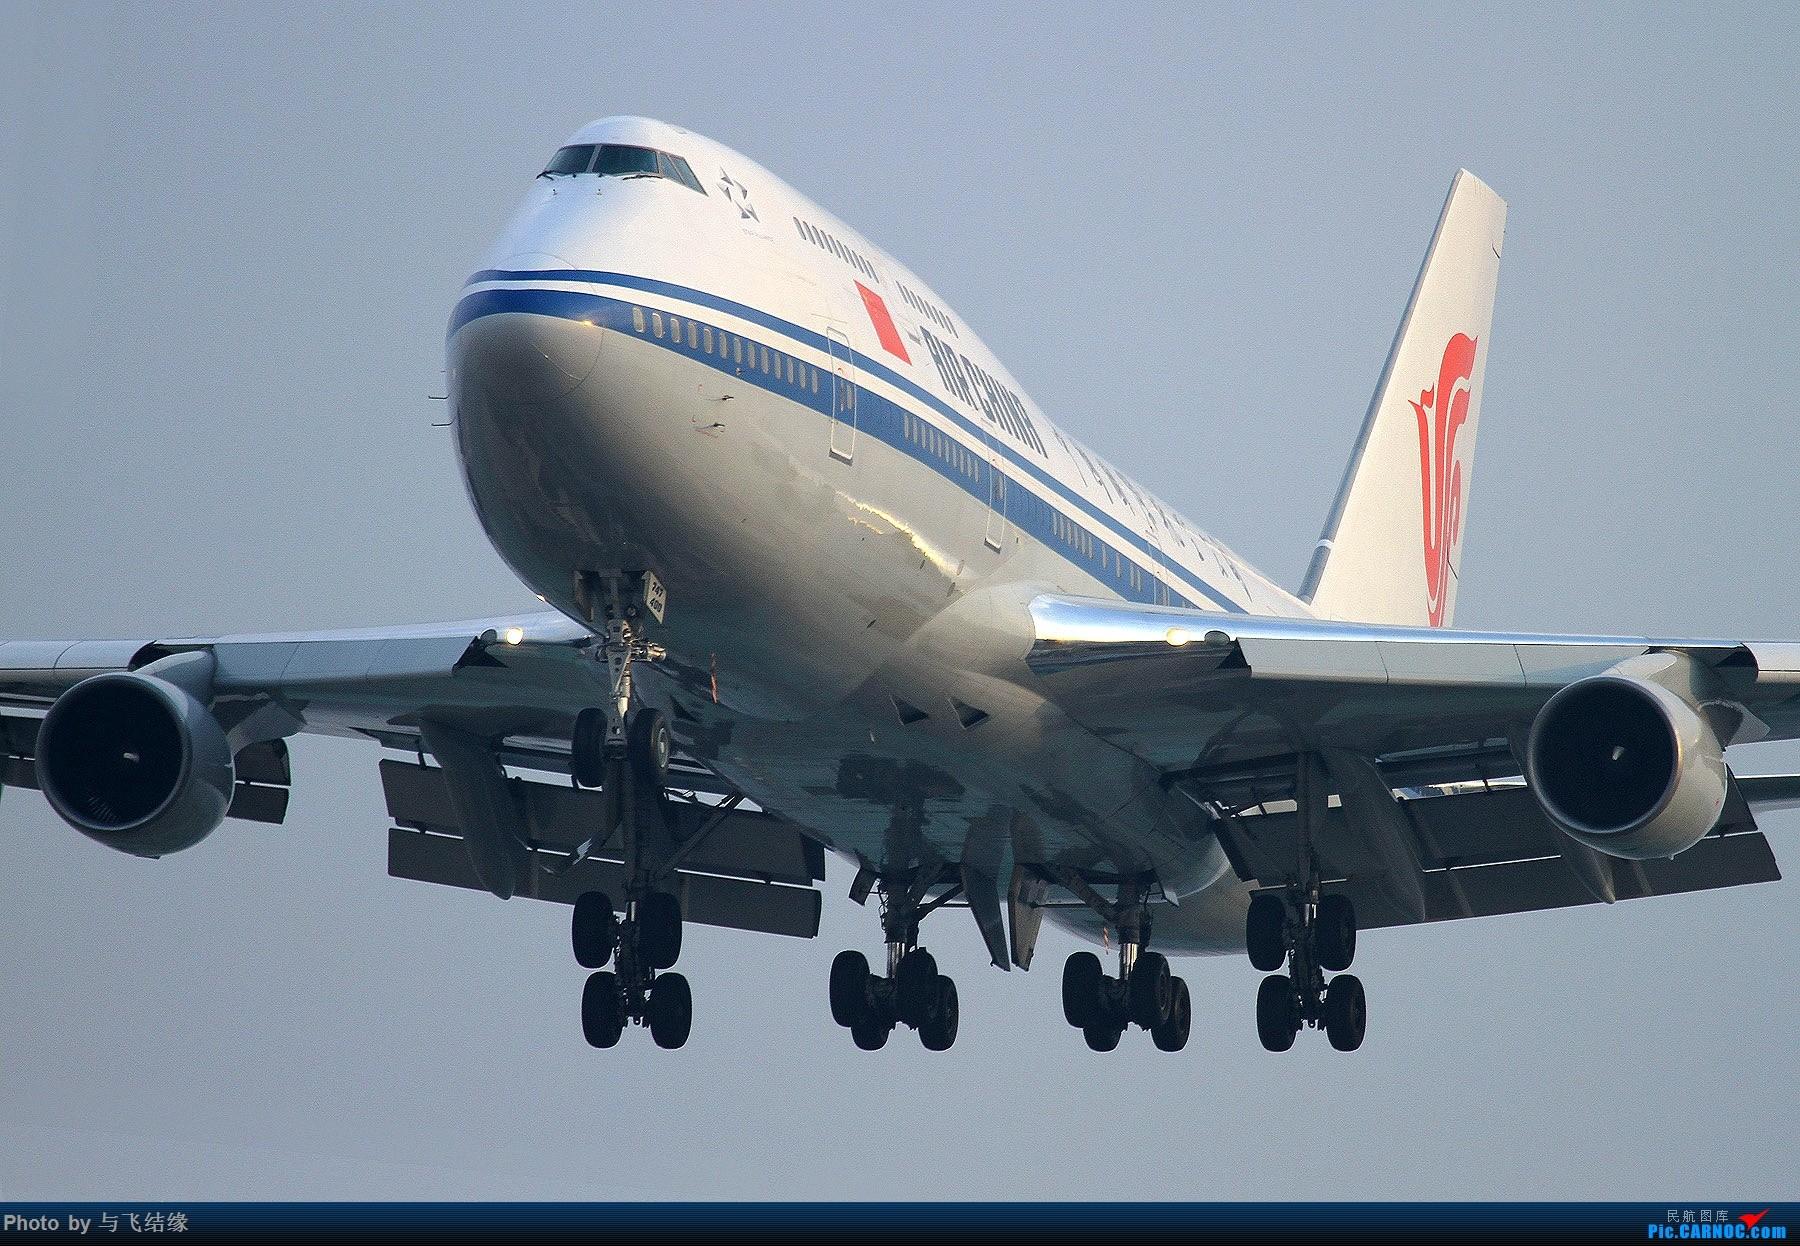 Re:[原创]中国国际航空Boeing 747-400,B-2447. BOEING 747-400 B-2447 中国北京首都国际机场